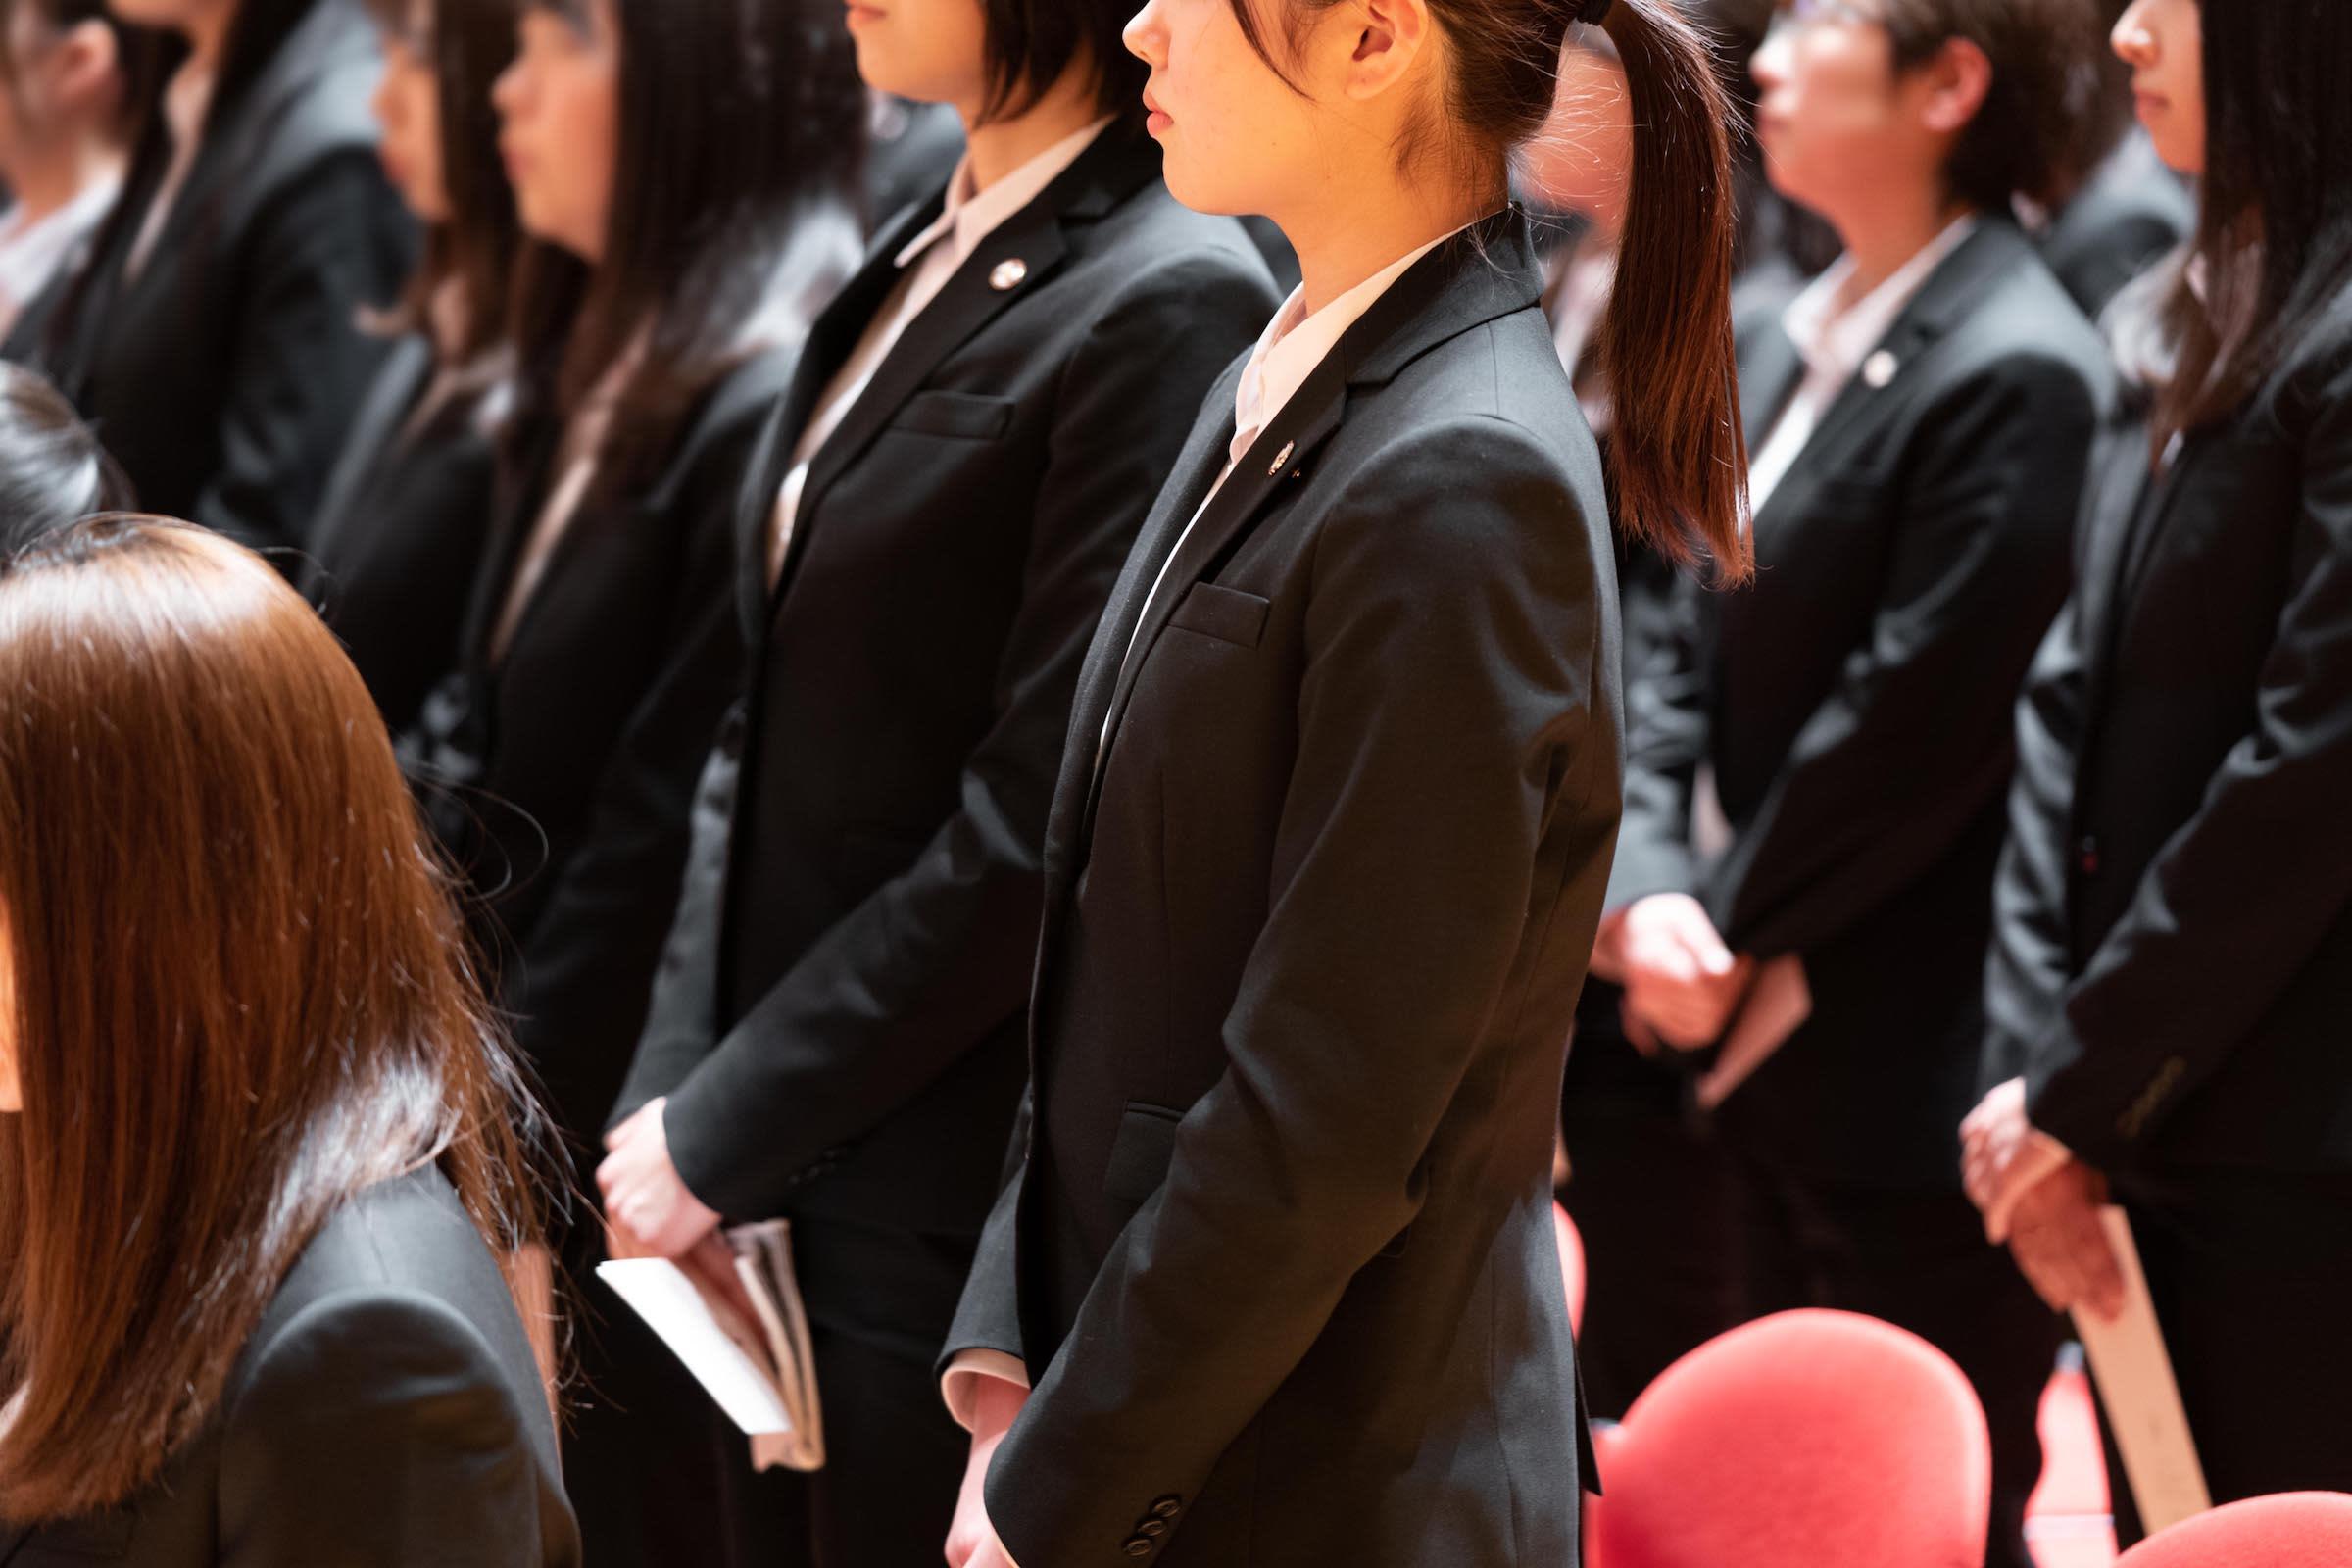 f6720648d5184 シリーズとして販売している女性向けのジャケット、スカート、シャツ、パンツが、東京女子医科大学および東京女子 医科大学看護専門学校の2019年度の新入生の標準服に ...